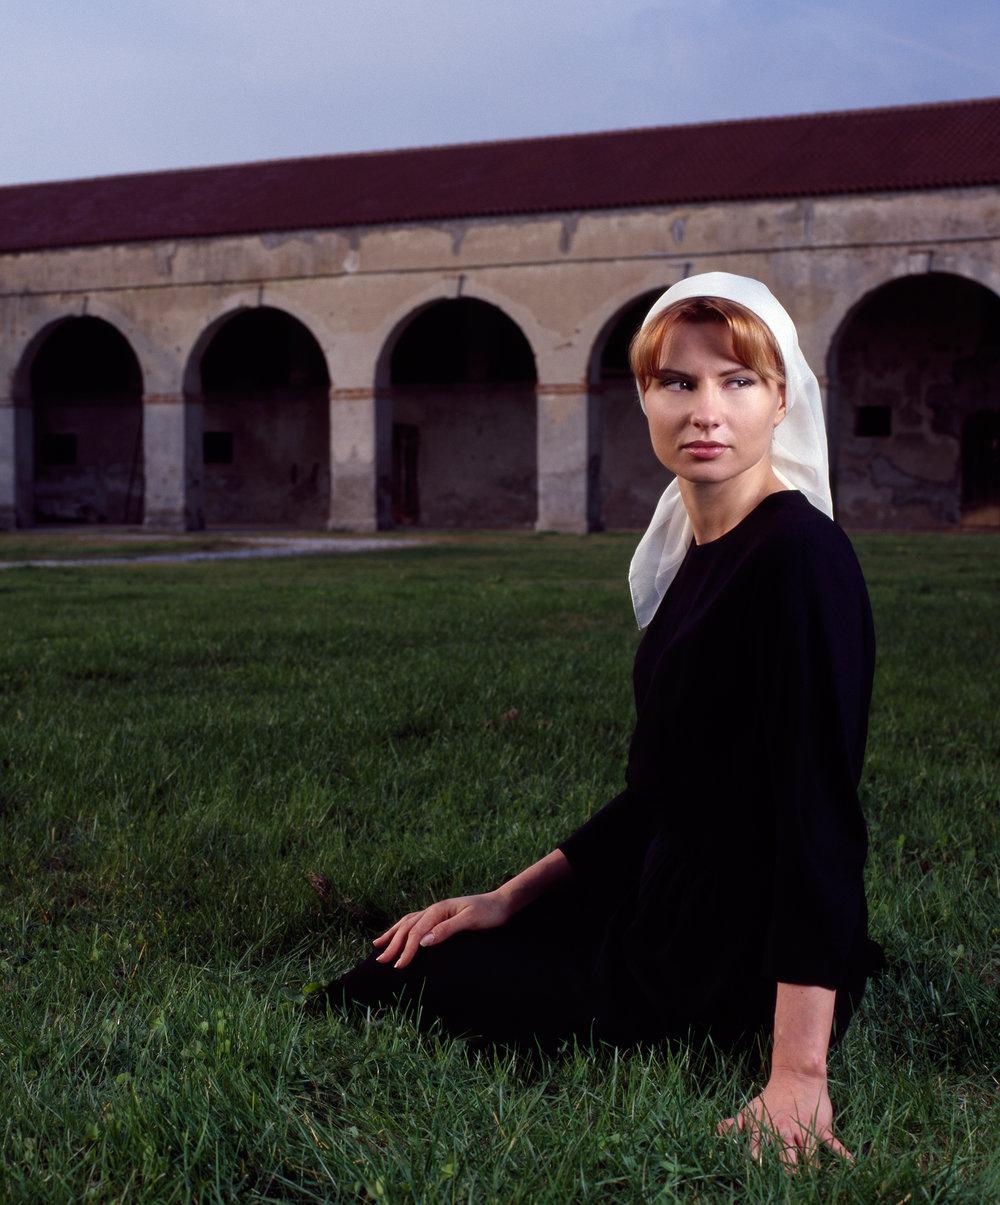 Post-War Italy: Nun - 2007   Media Stories